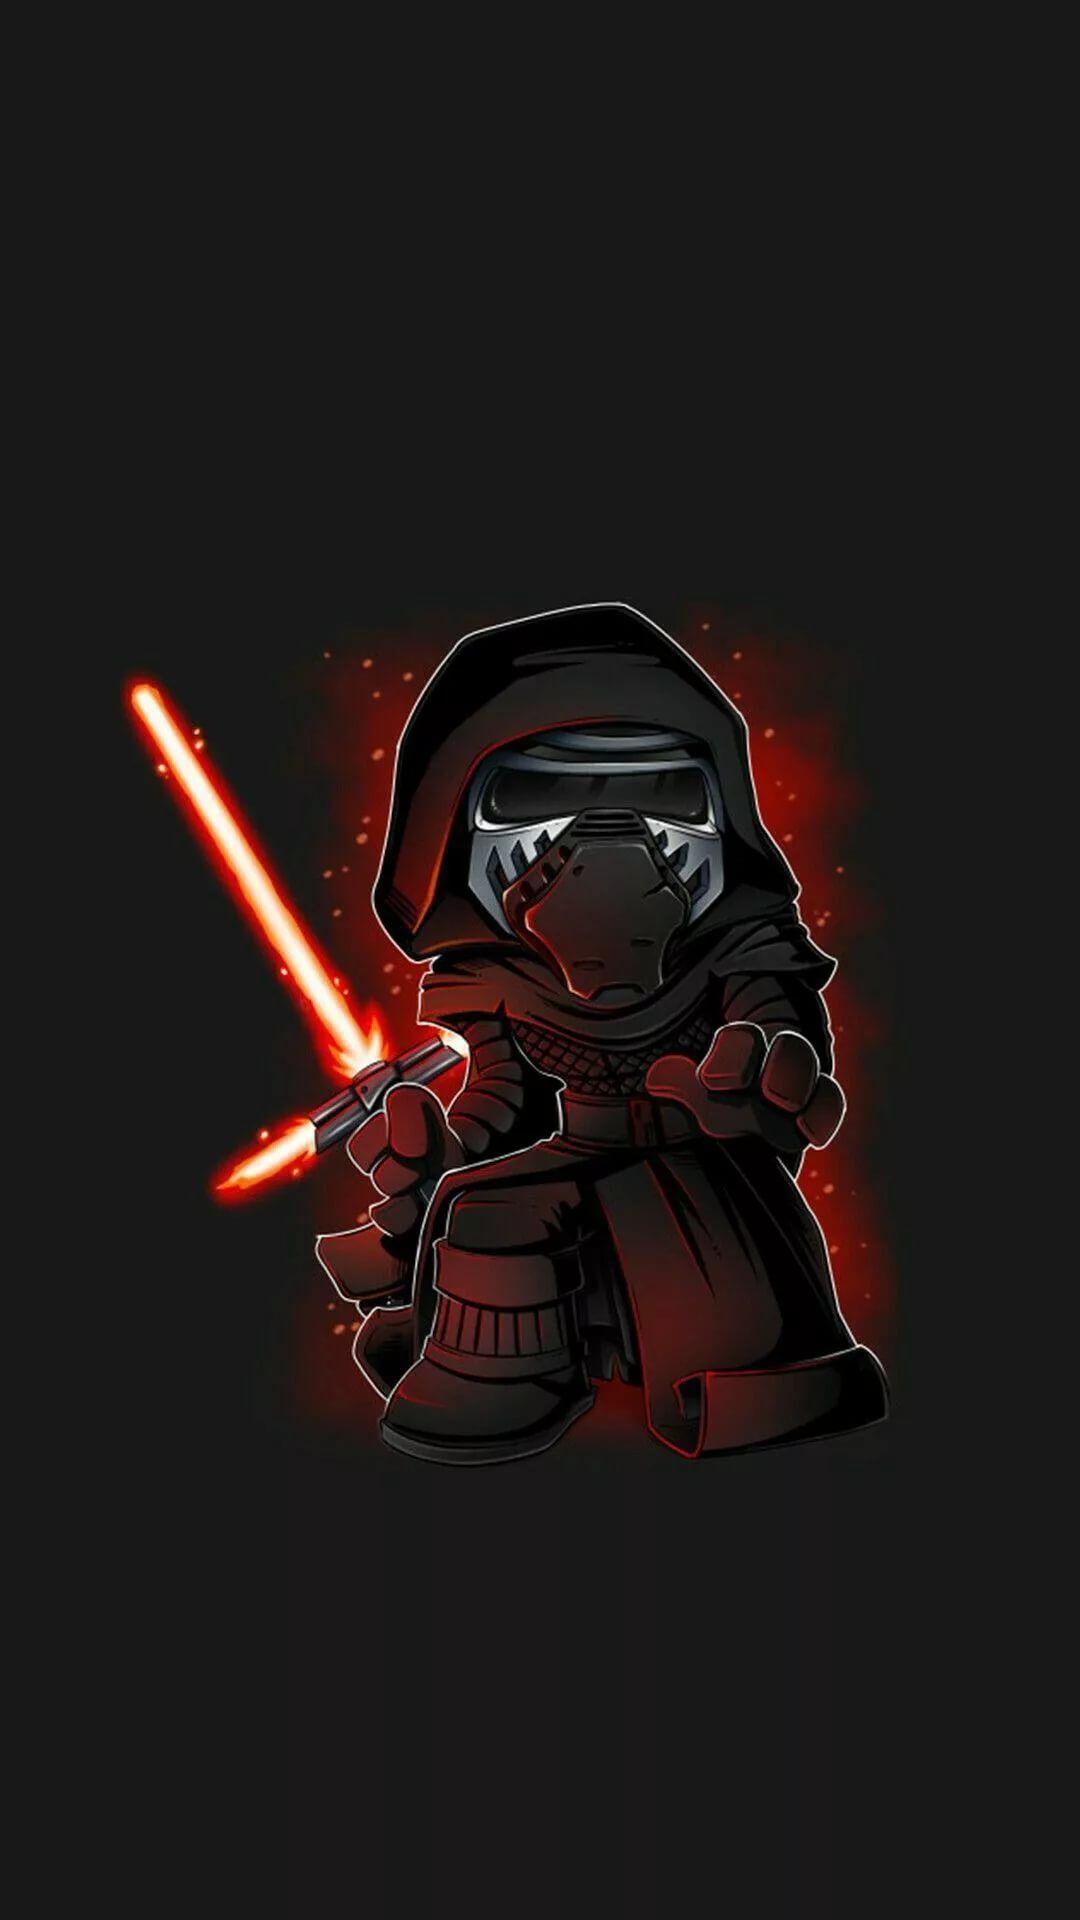 Lego Star Wars wallpaper